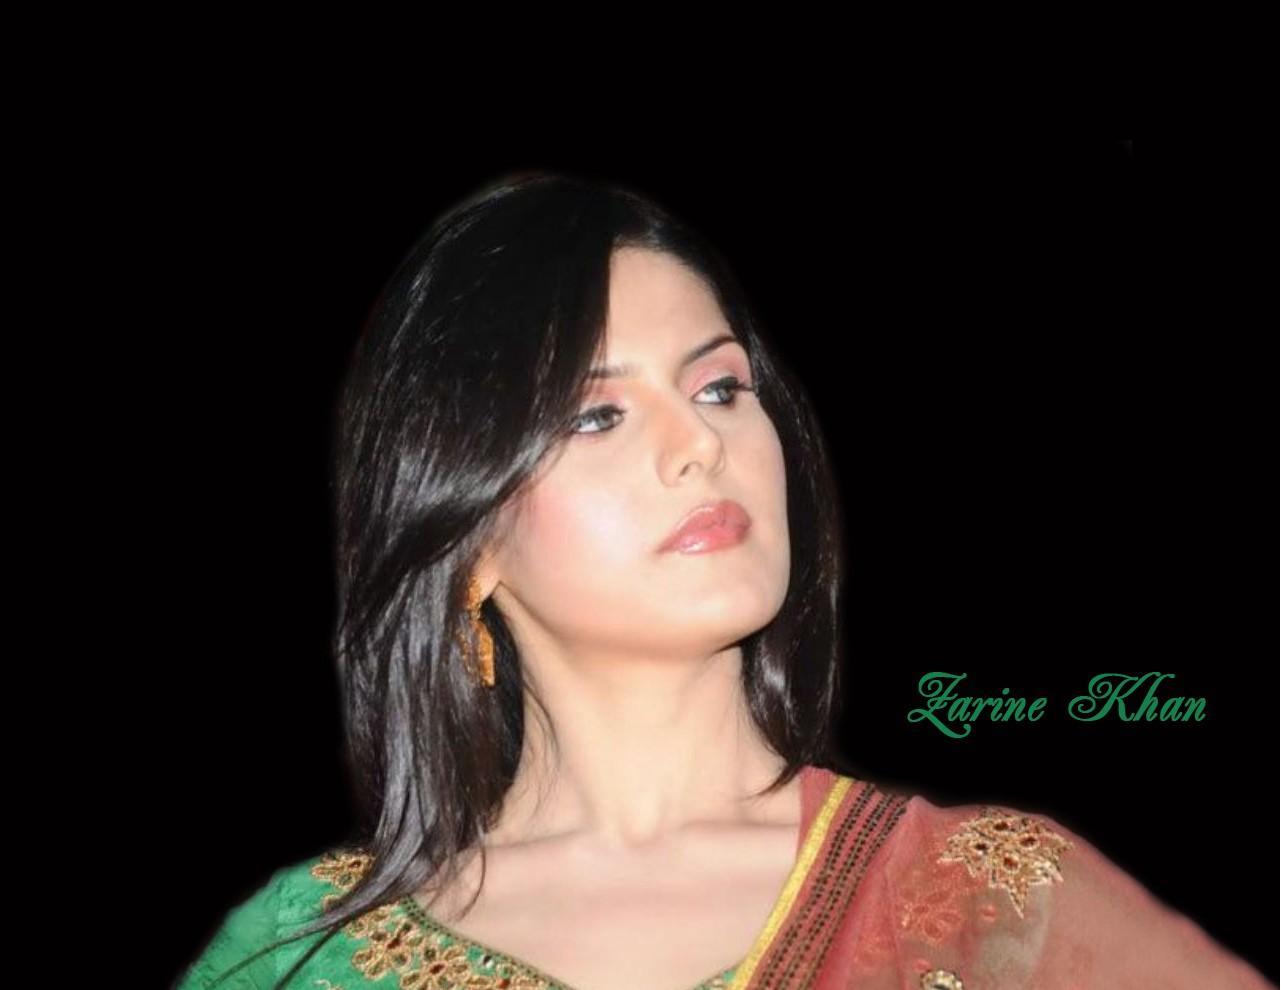 Zarin Khan HD Wallpape...